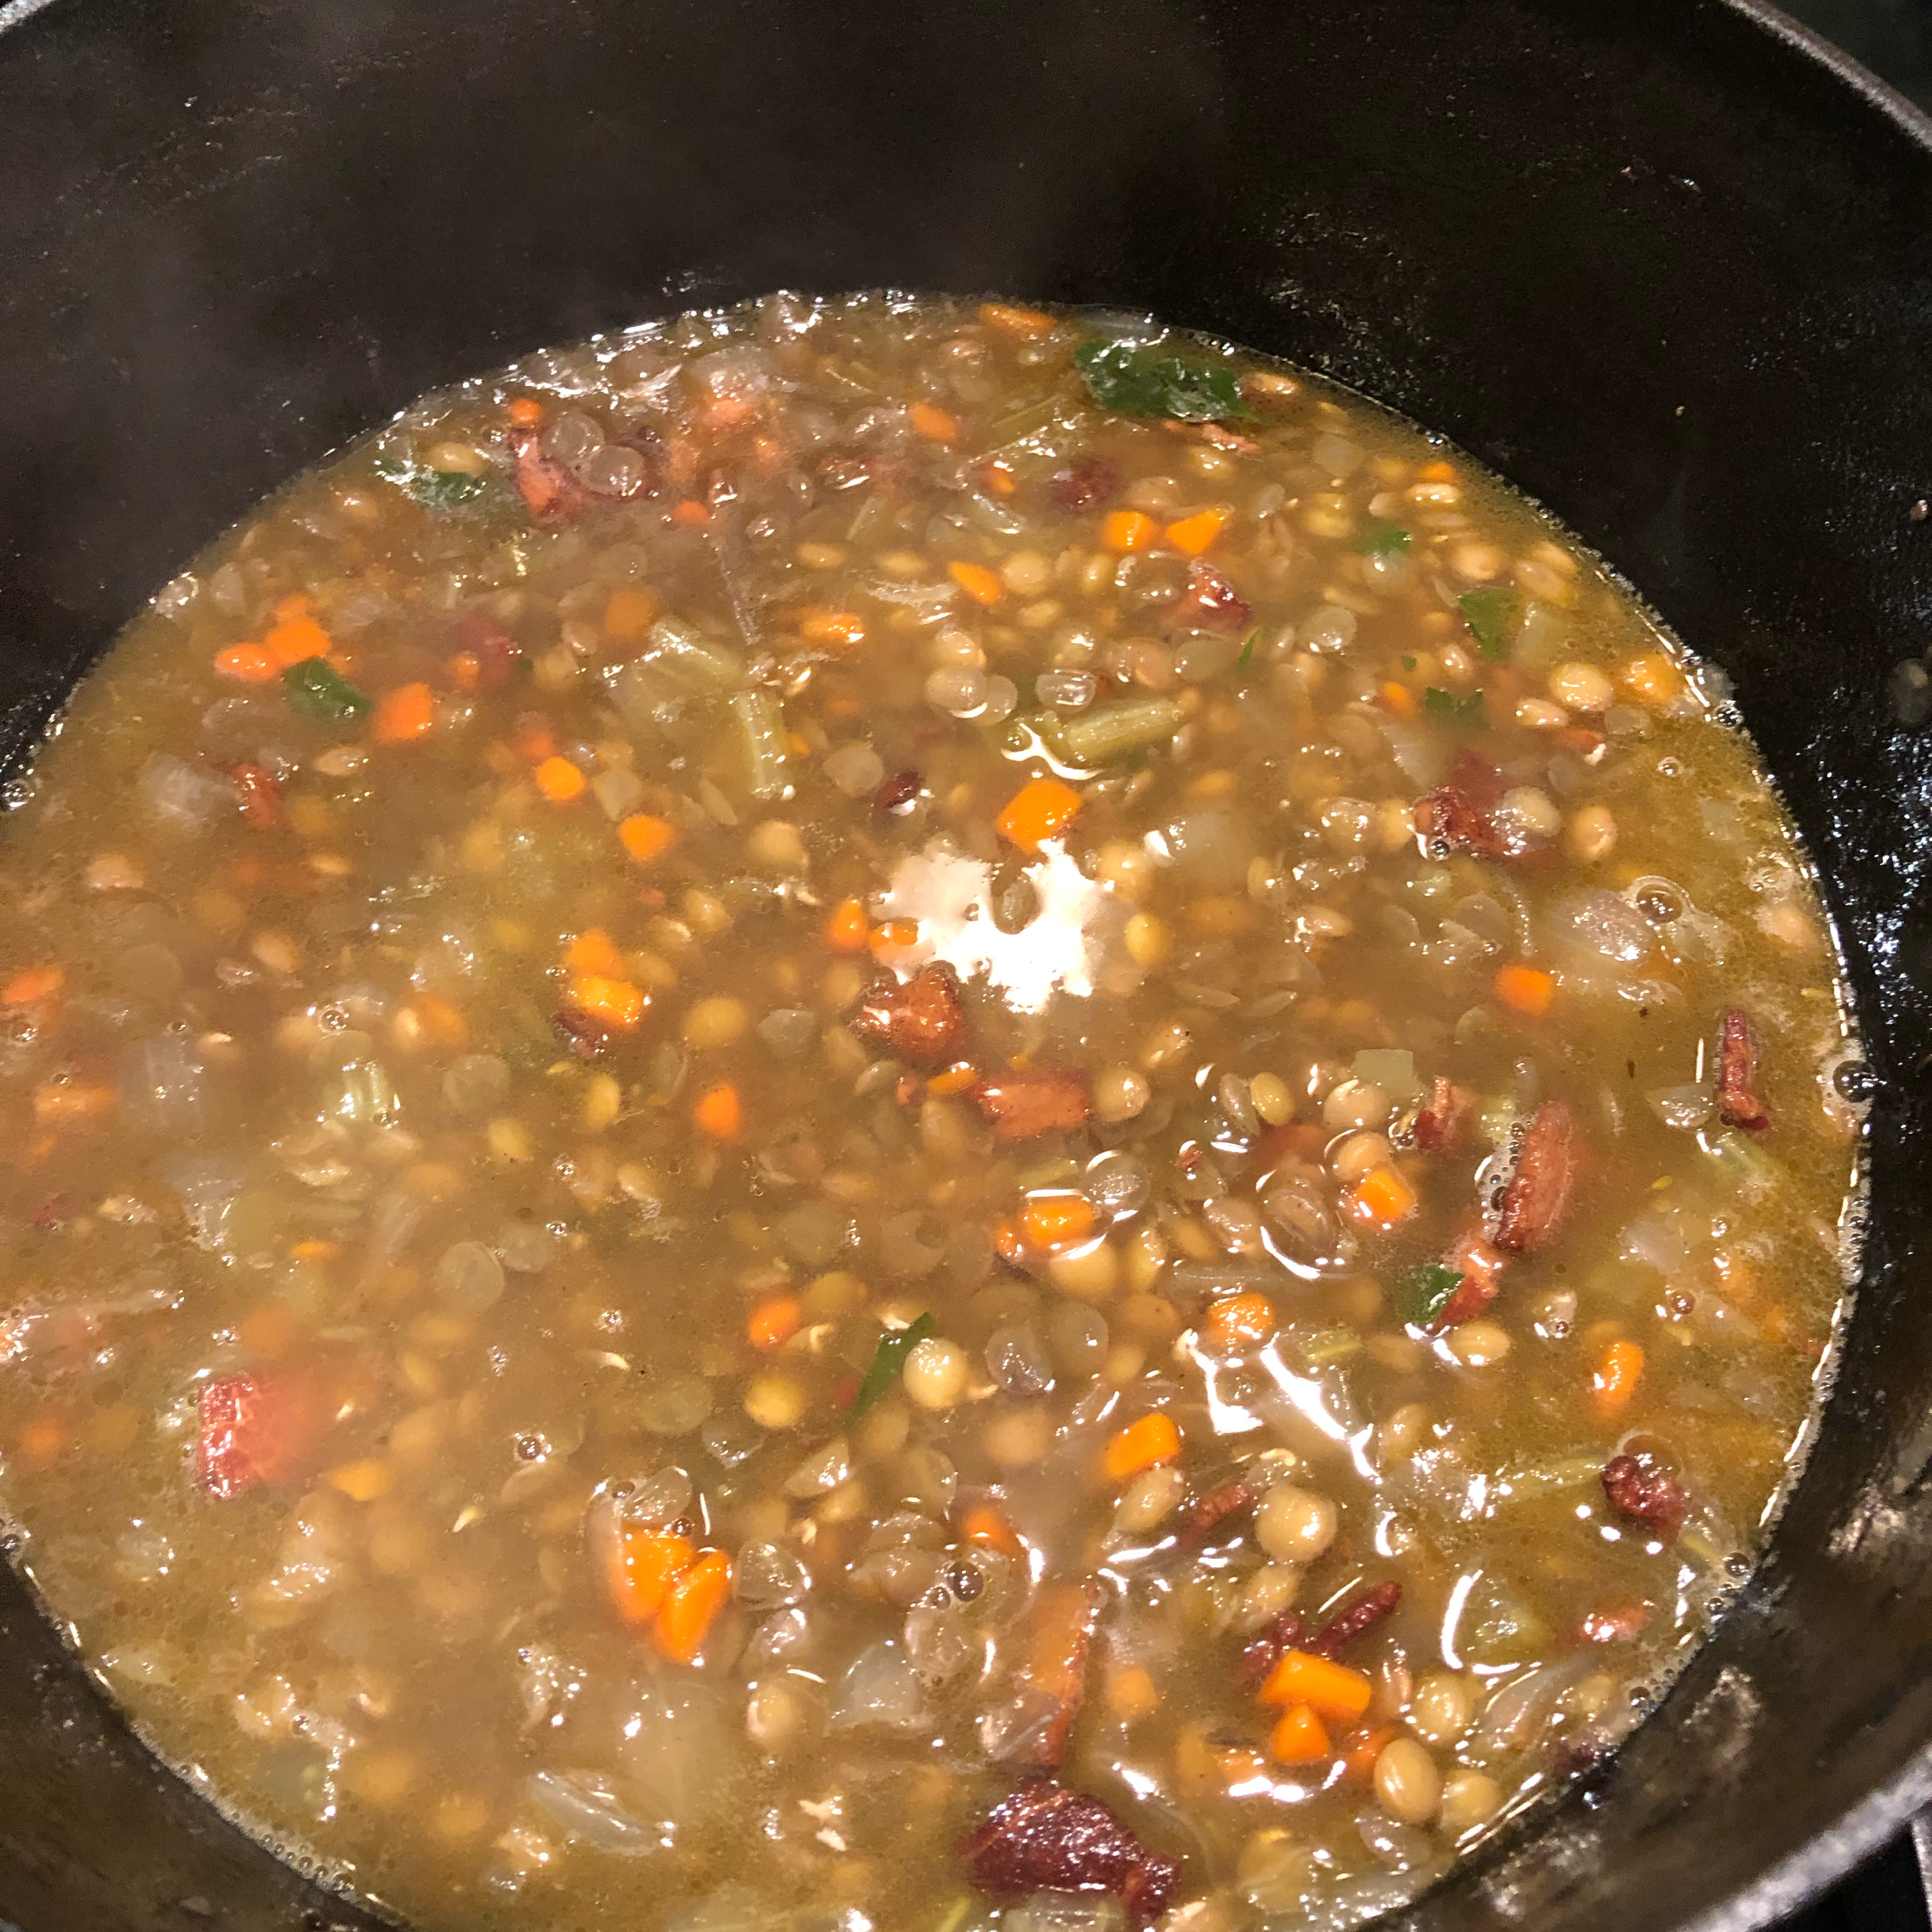 Chef John's Black Lentil Soup Jeanne Summa-Becvar